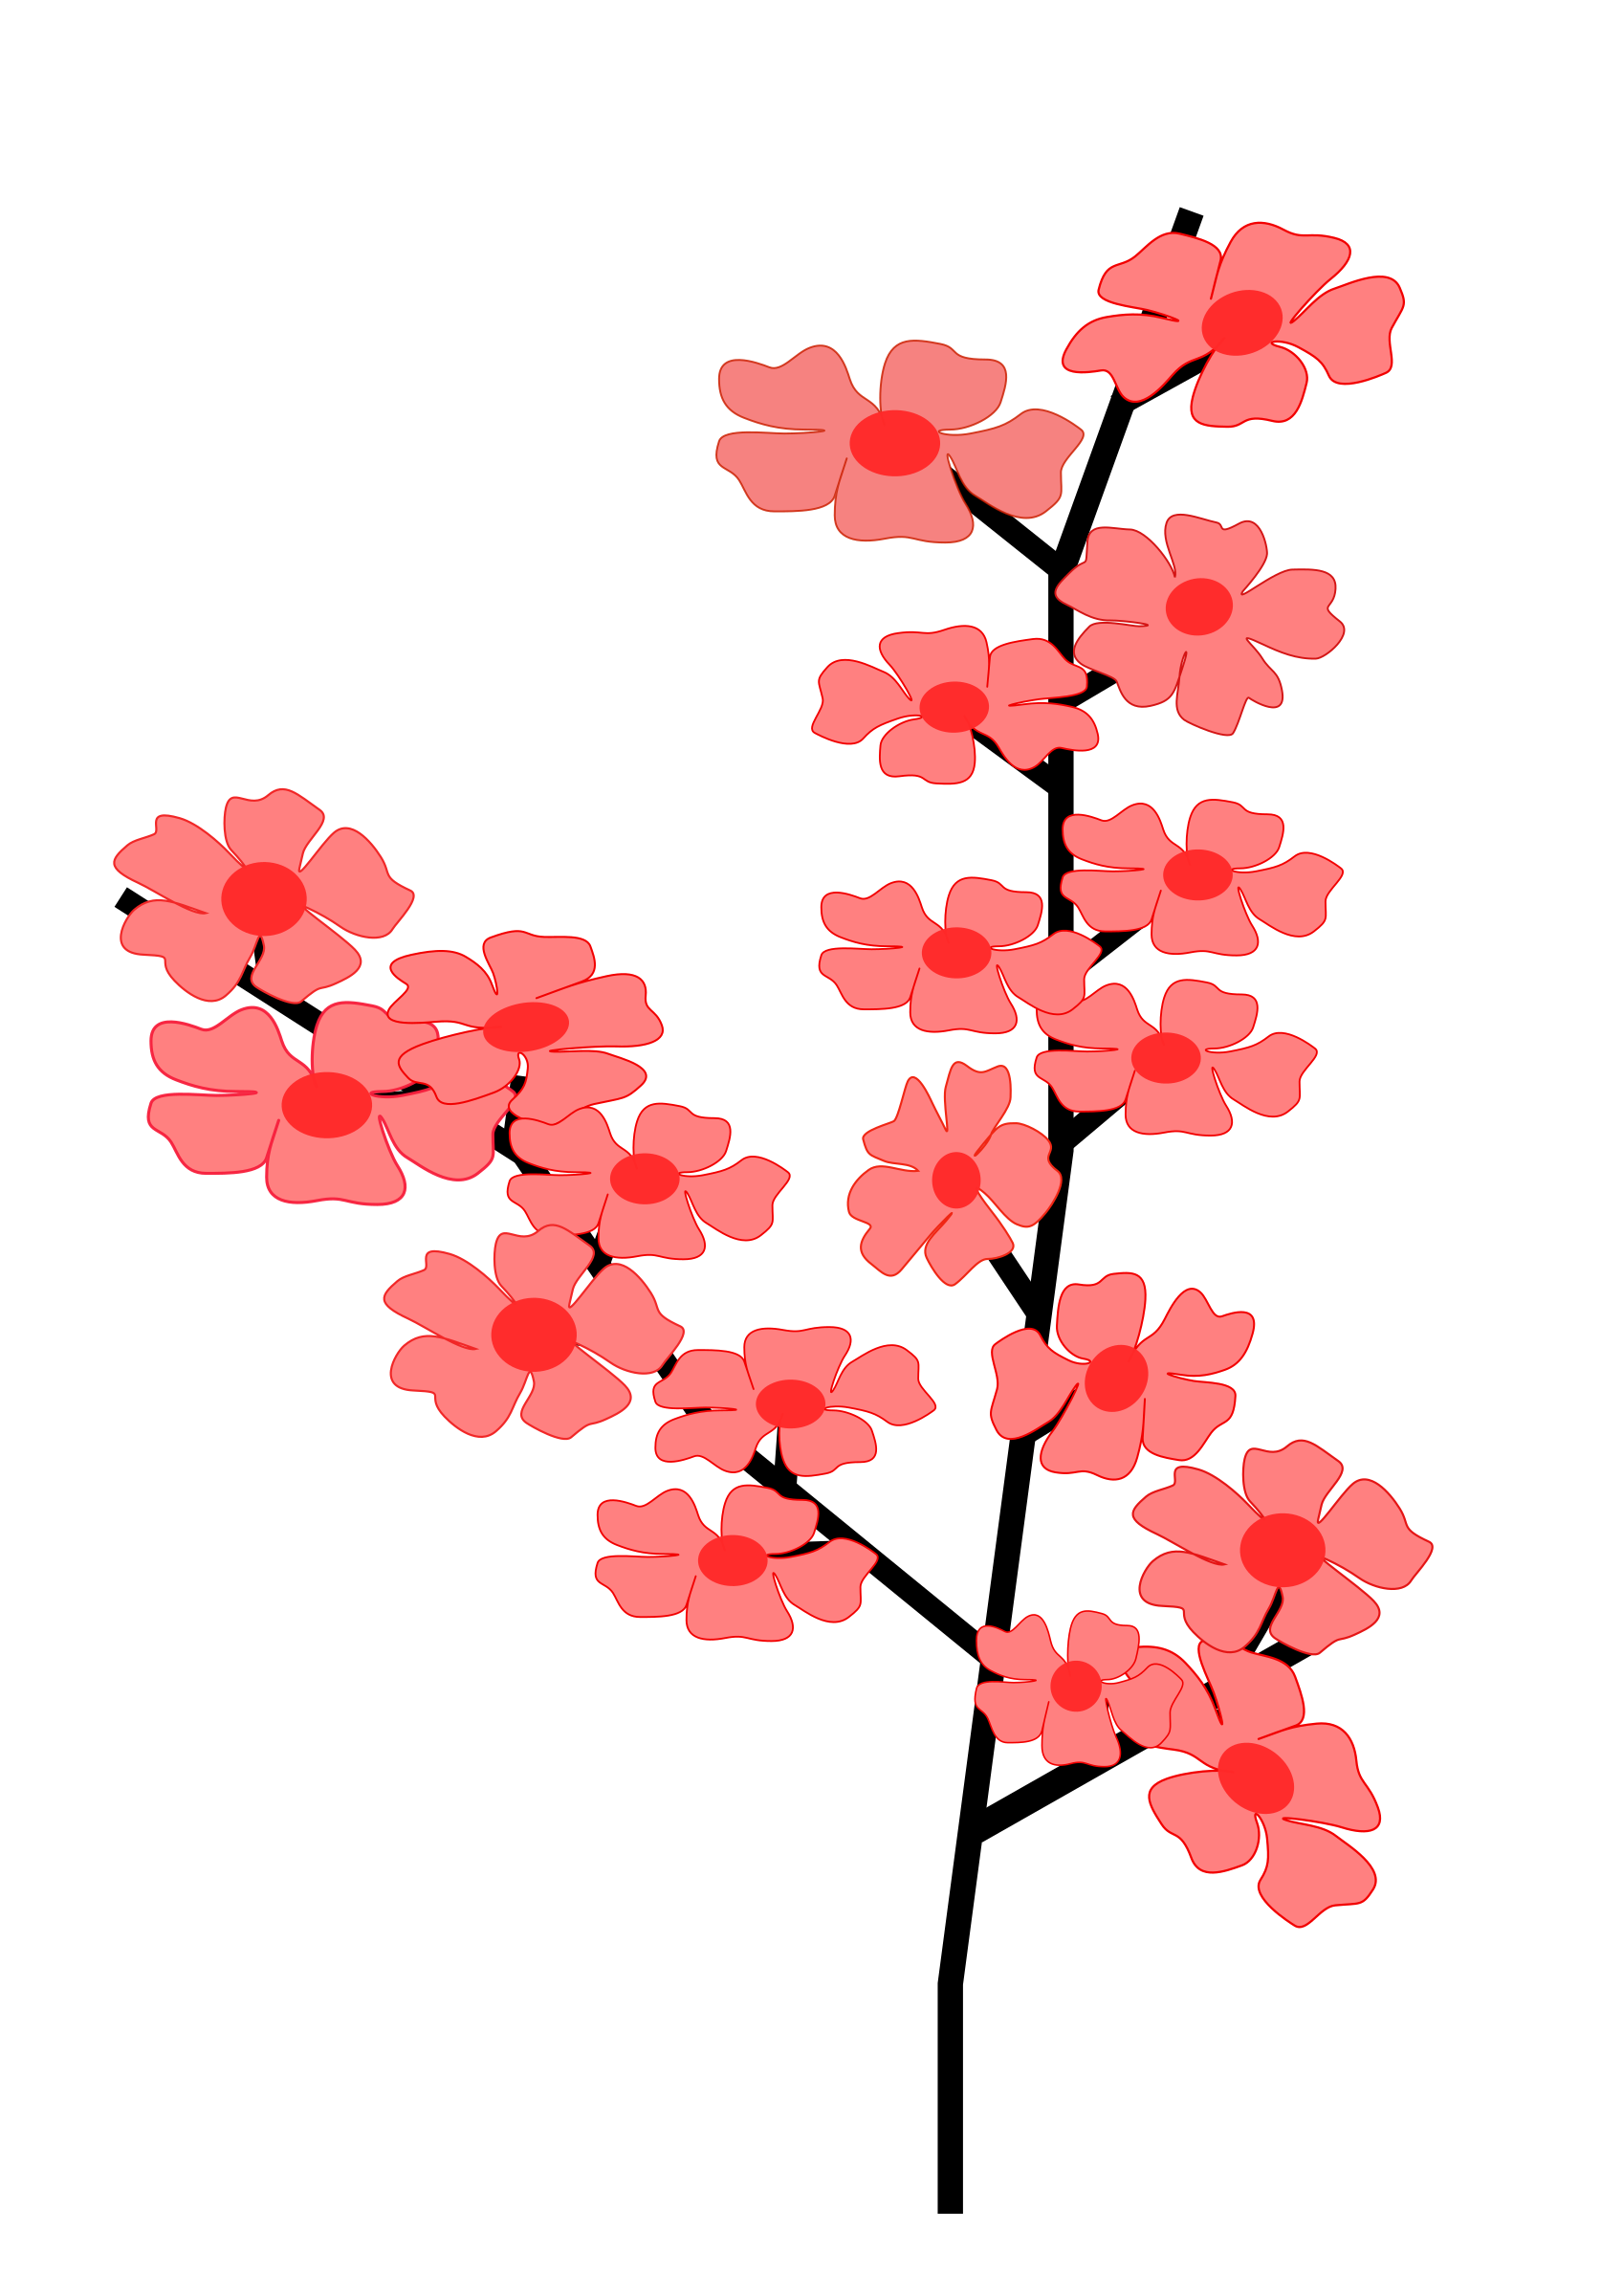 Anime flower png. Flowers sakura icons free